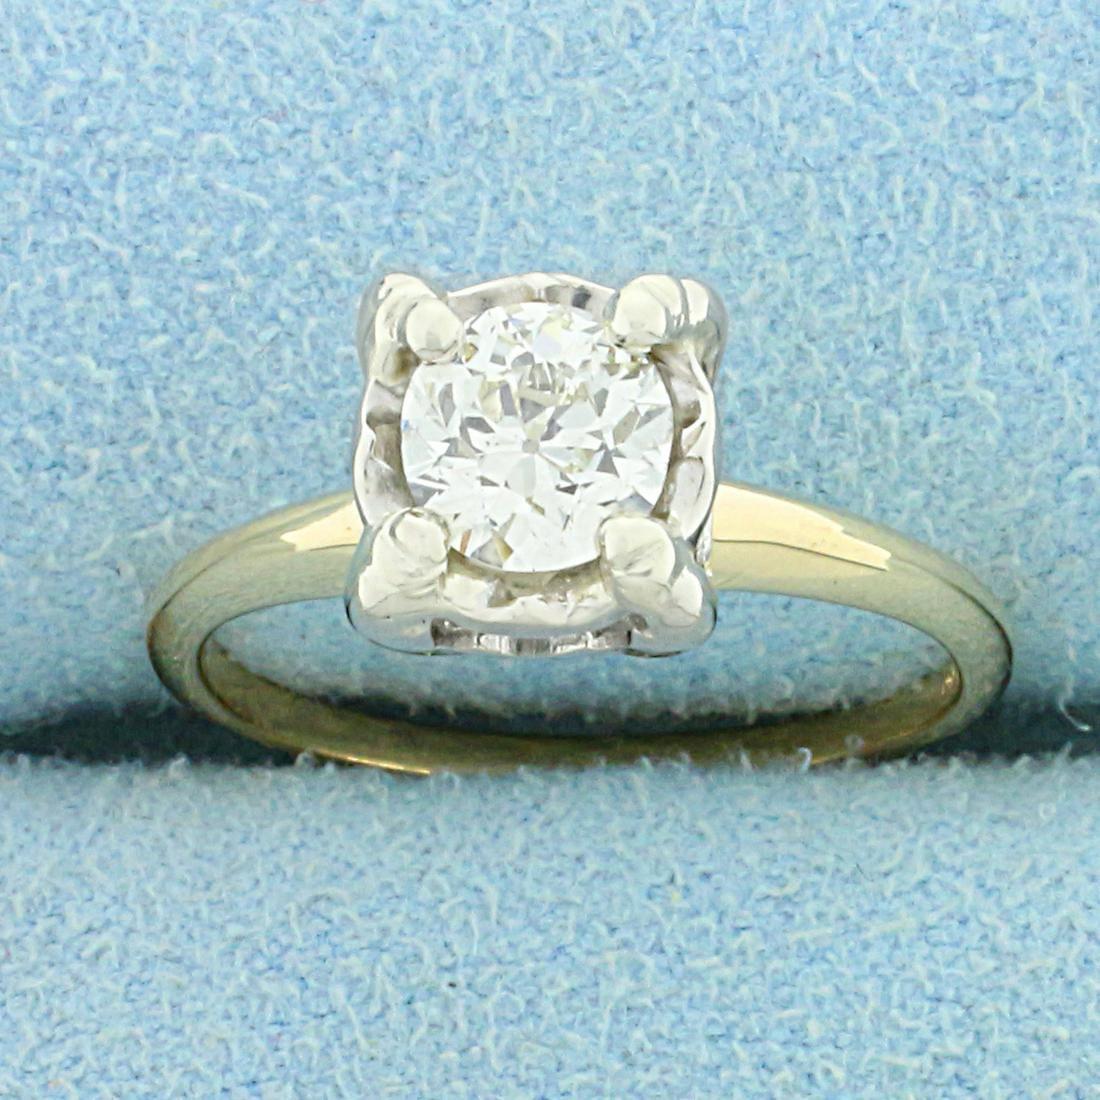 Antique 3/4ct Solitaire Old European Cut Diamond Ring